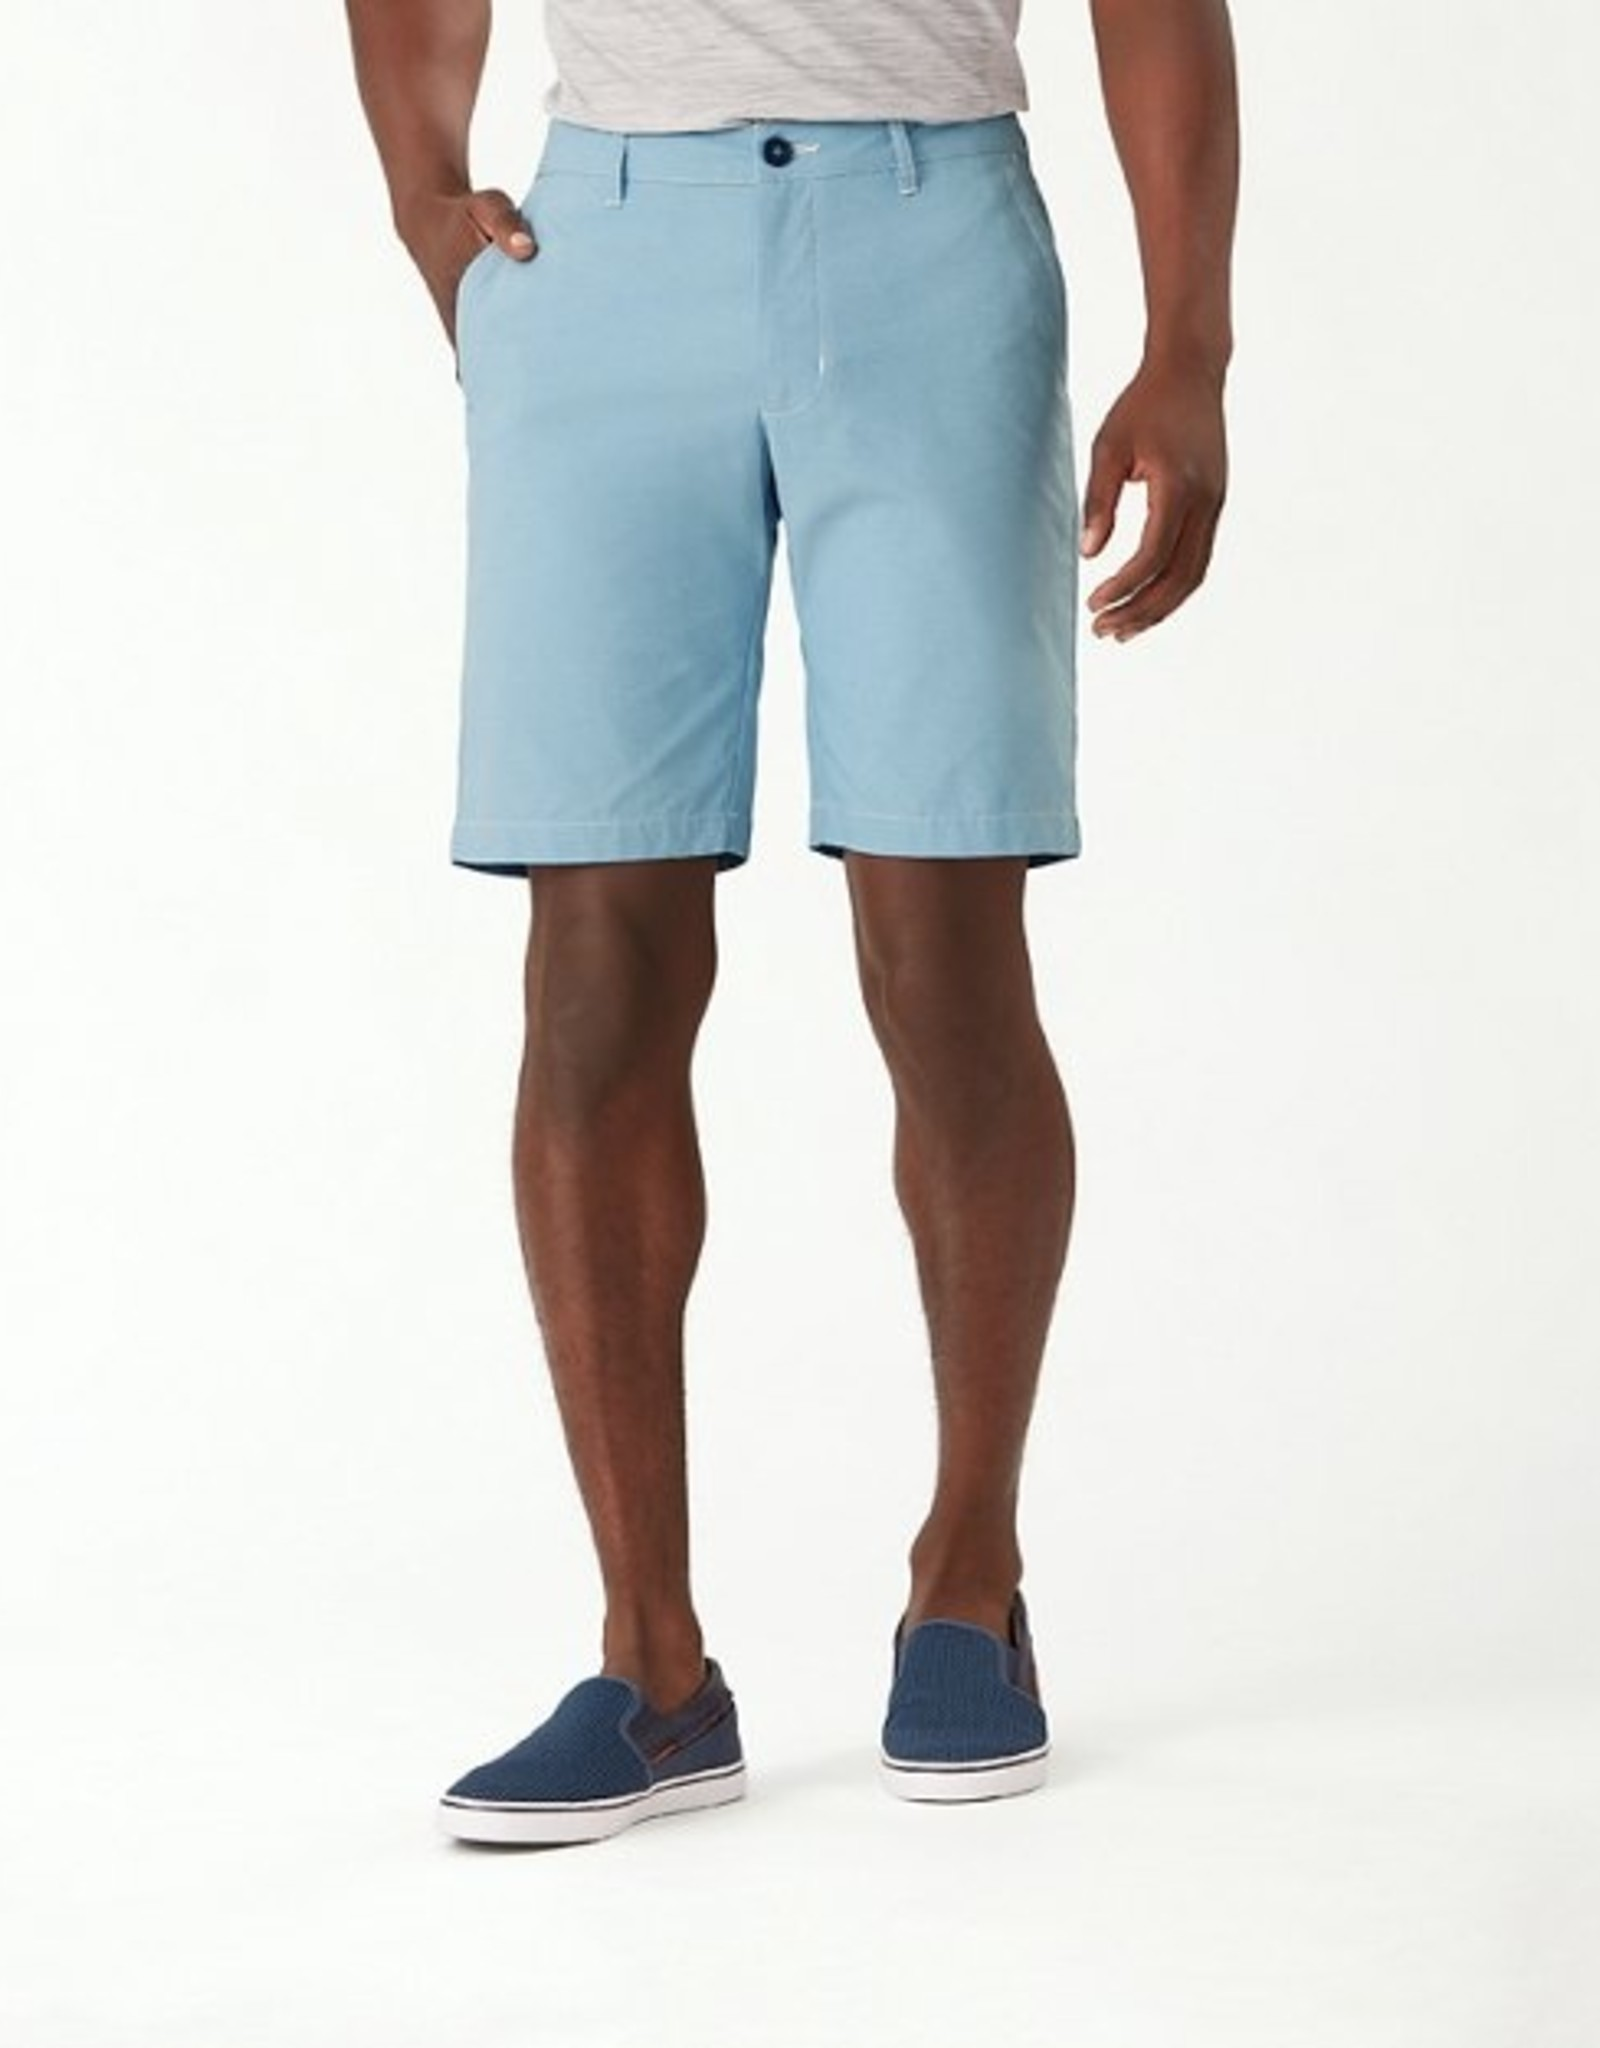 Tommy Bahama Chip Short Oxford Shorts